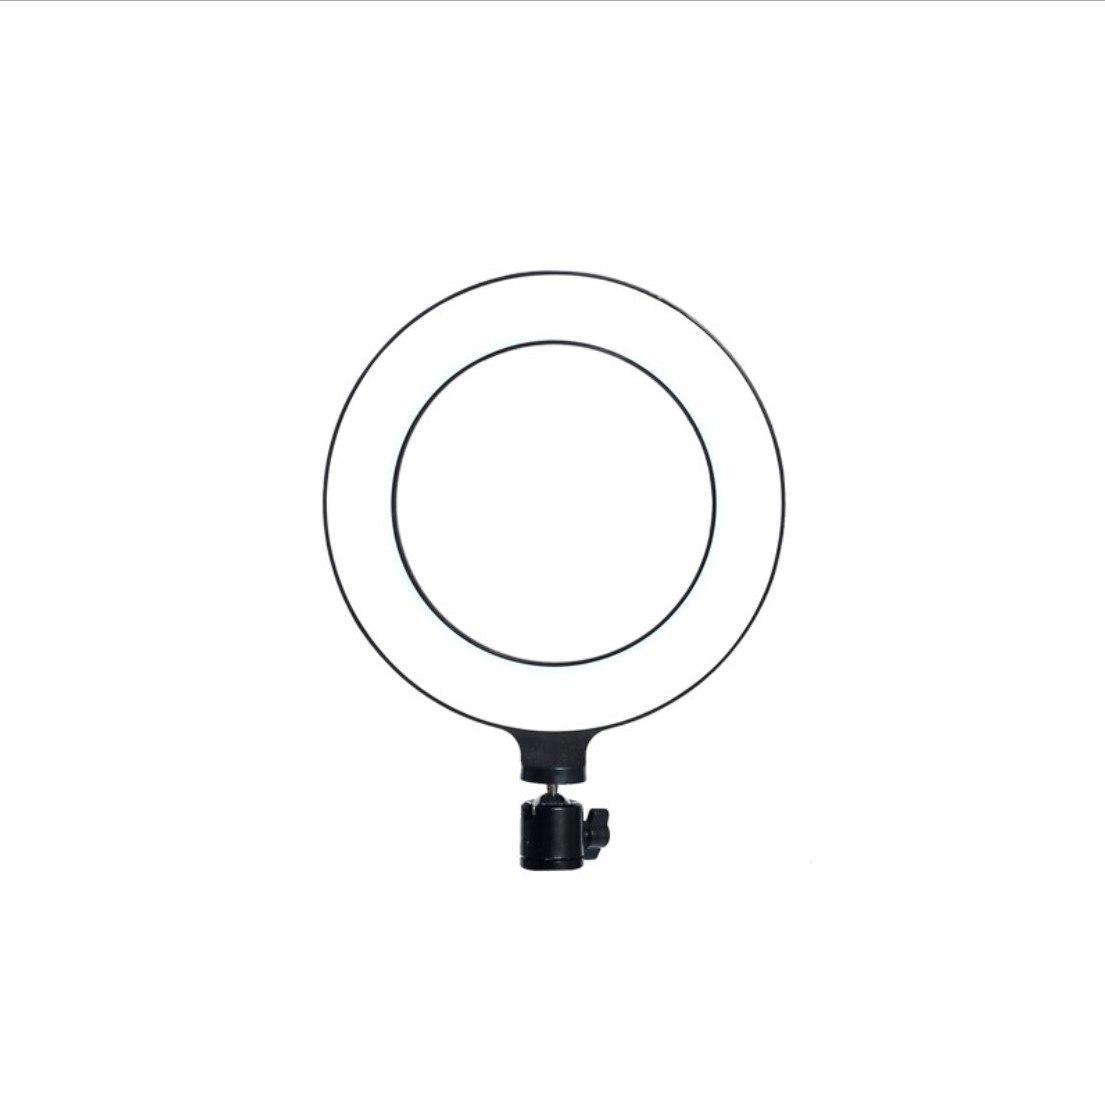 Кольцевая лампа DEKKO F 200